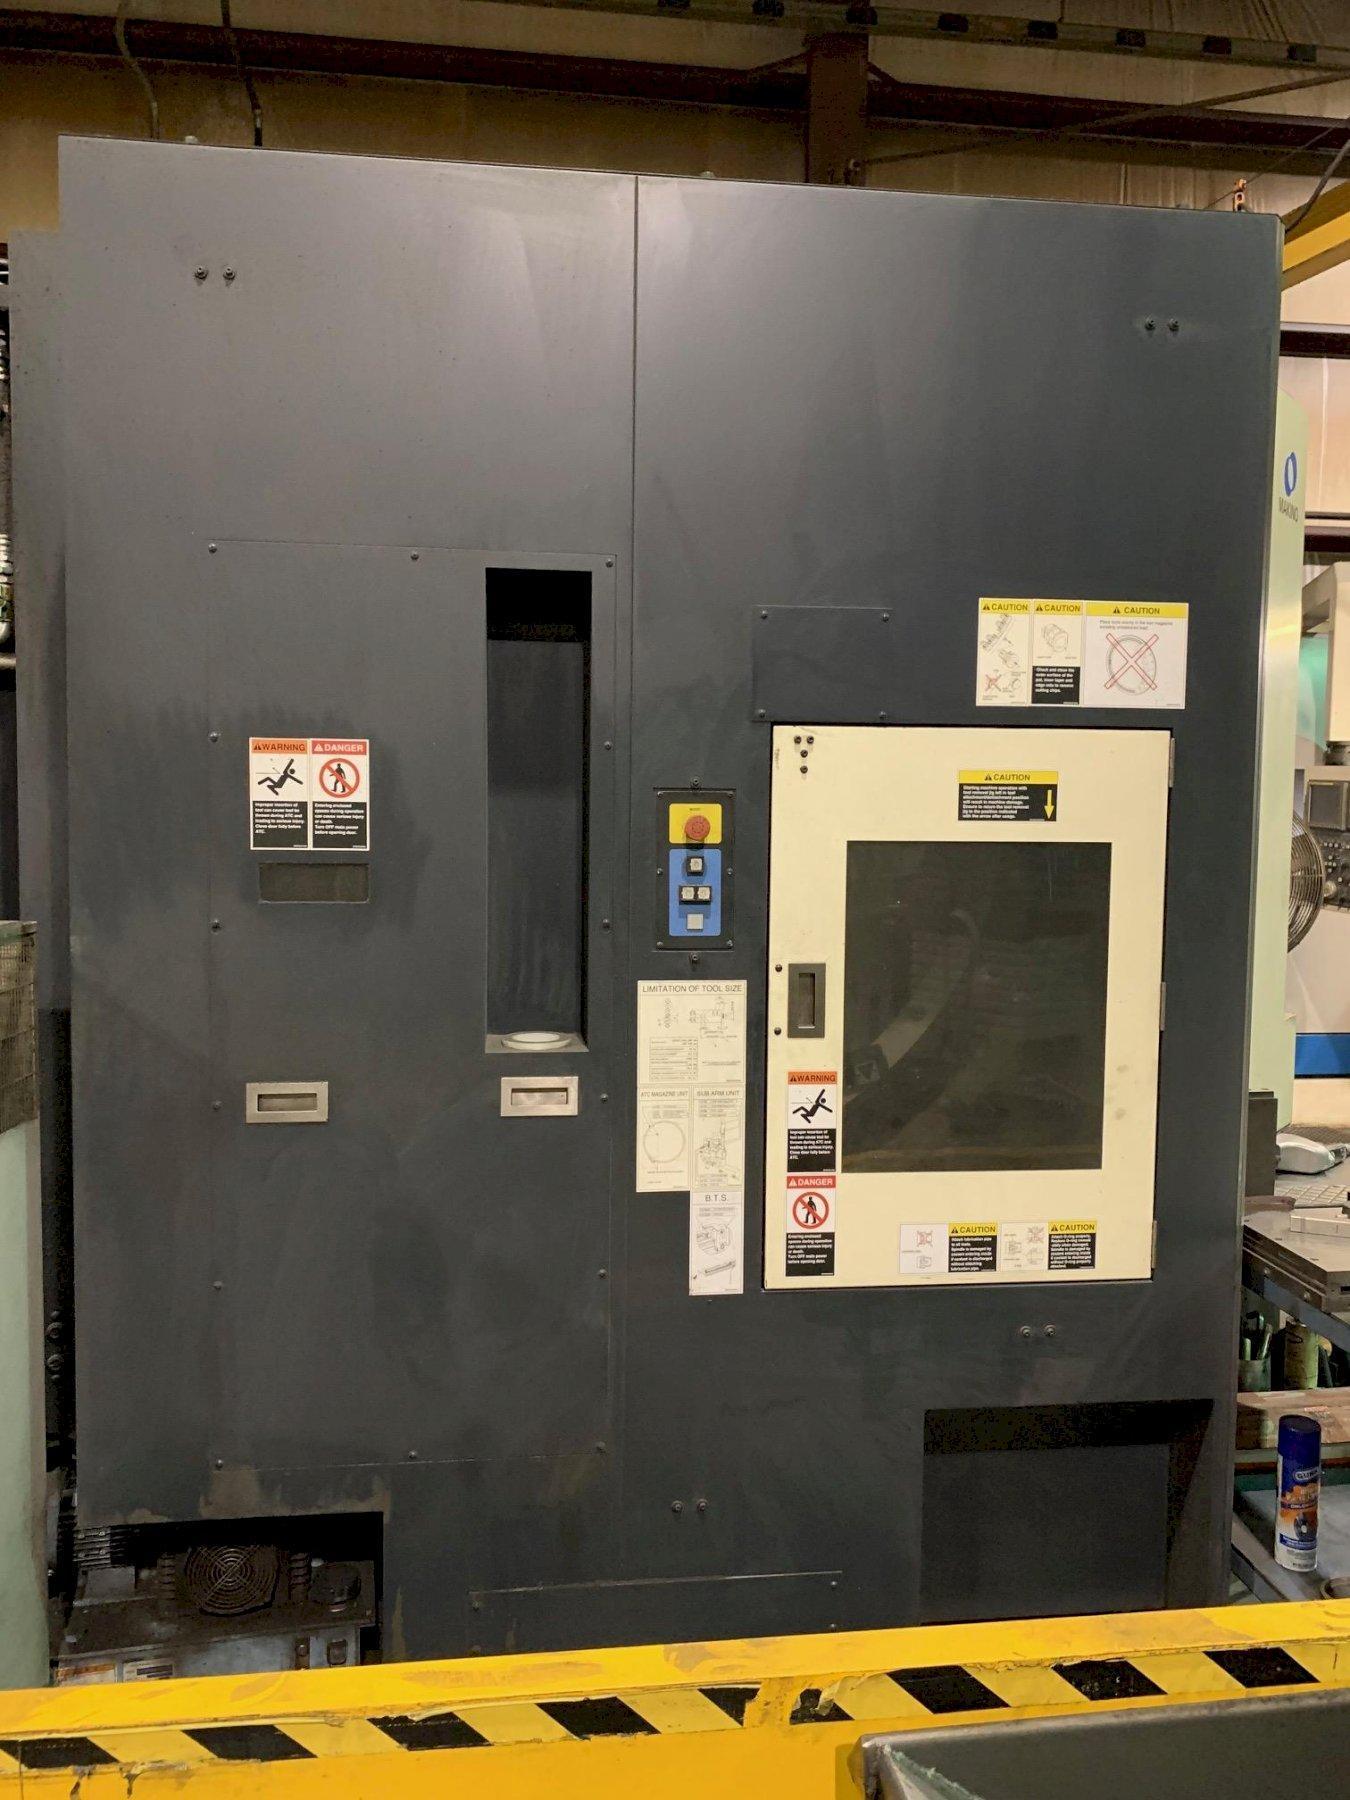 MAKINOMakino A71 CNC Horizontal Machining Center - 2 Available!